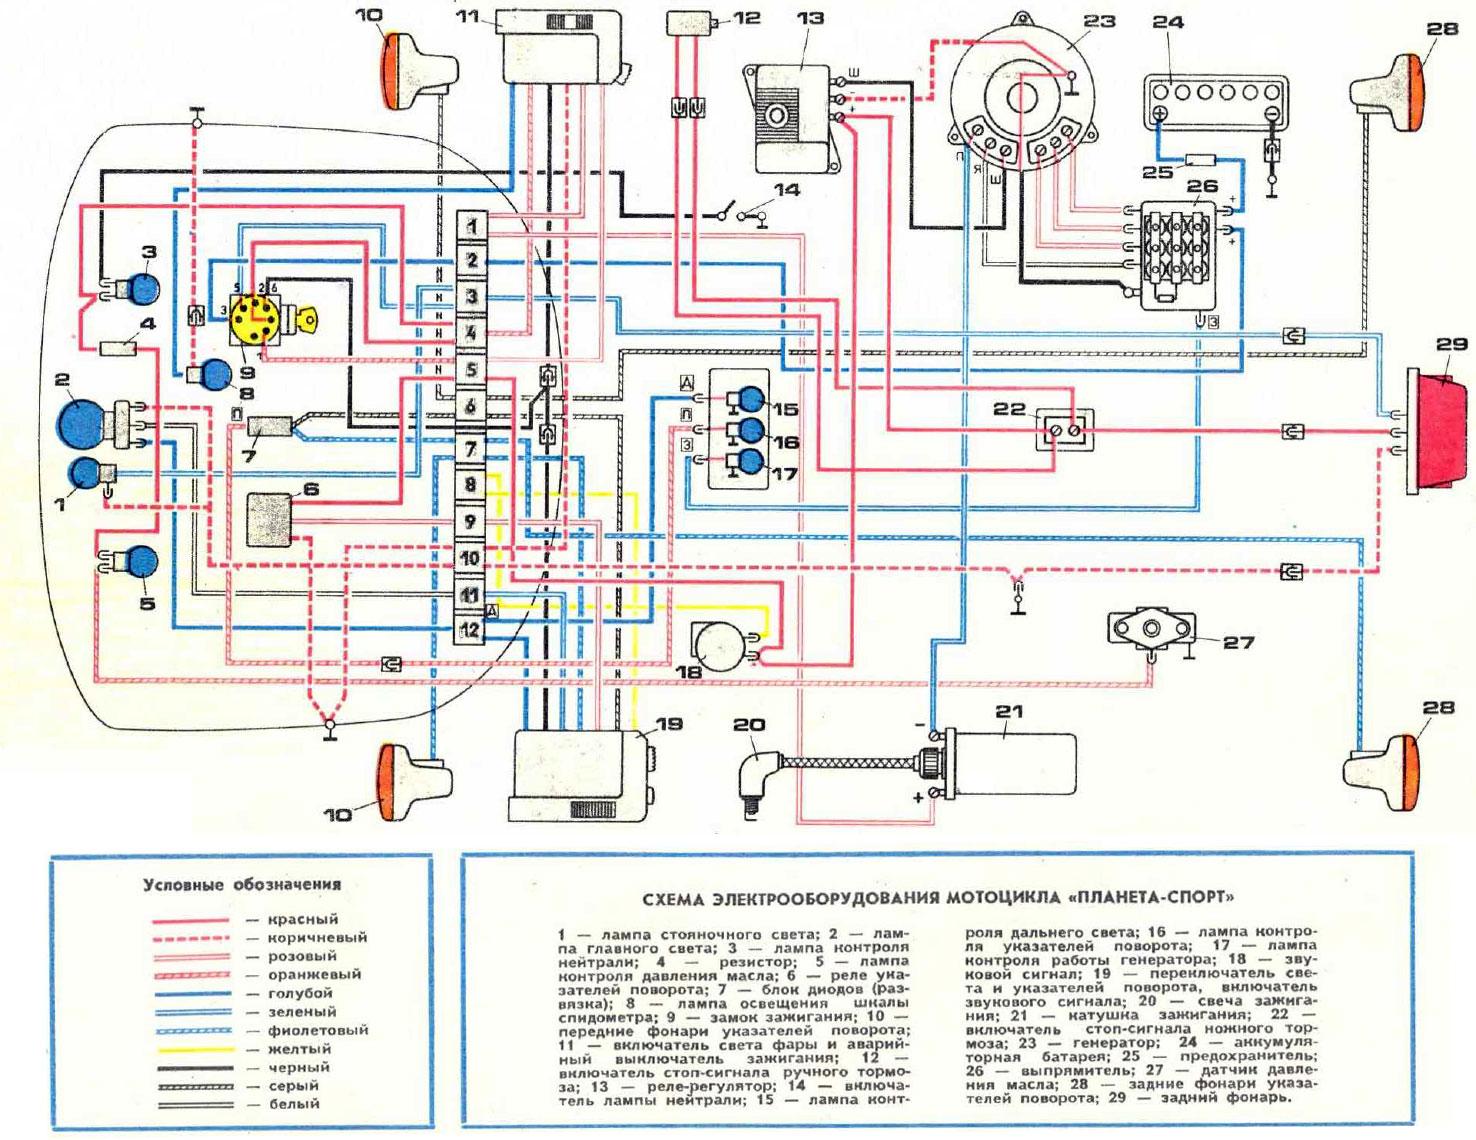 иж-18-е схема устройства